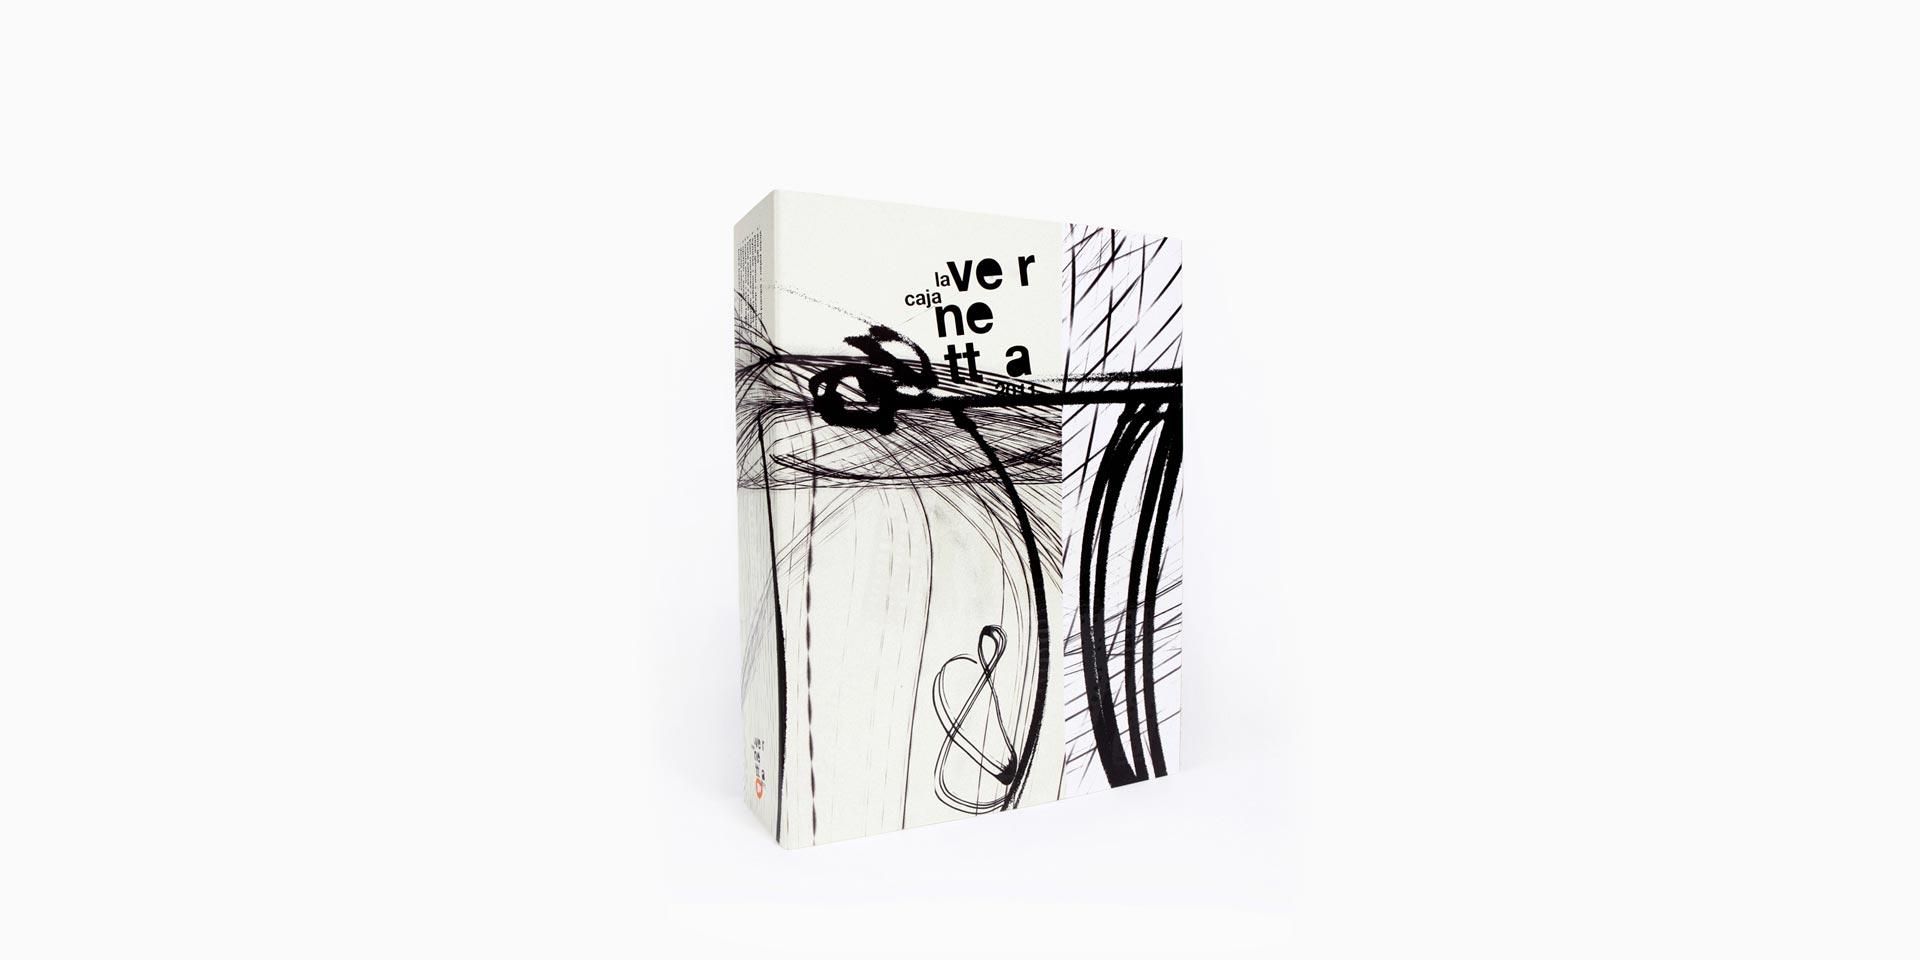 La Caja Vernetta